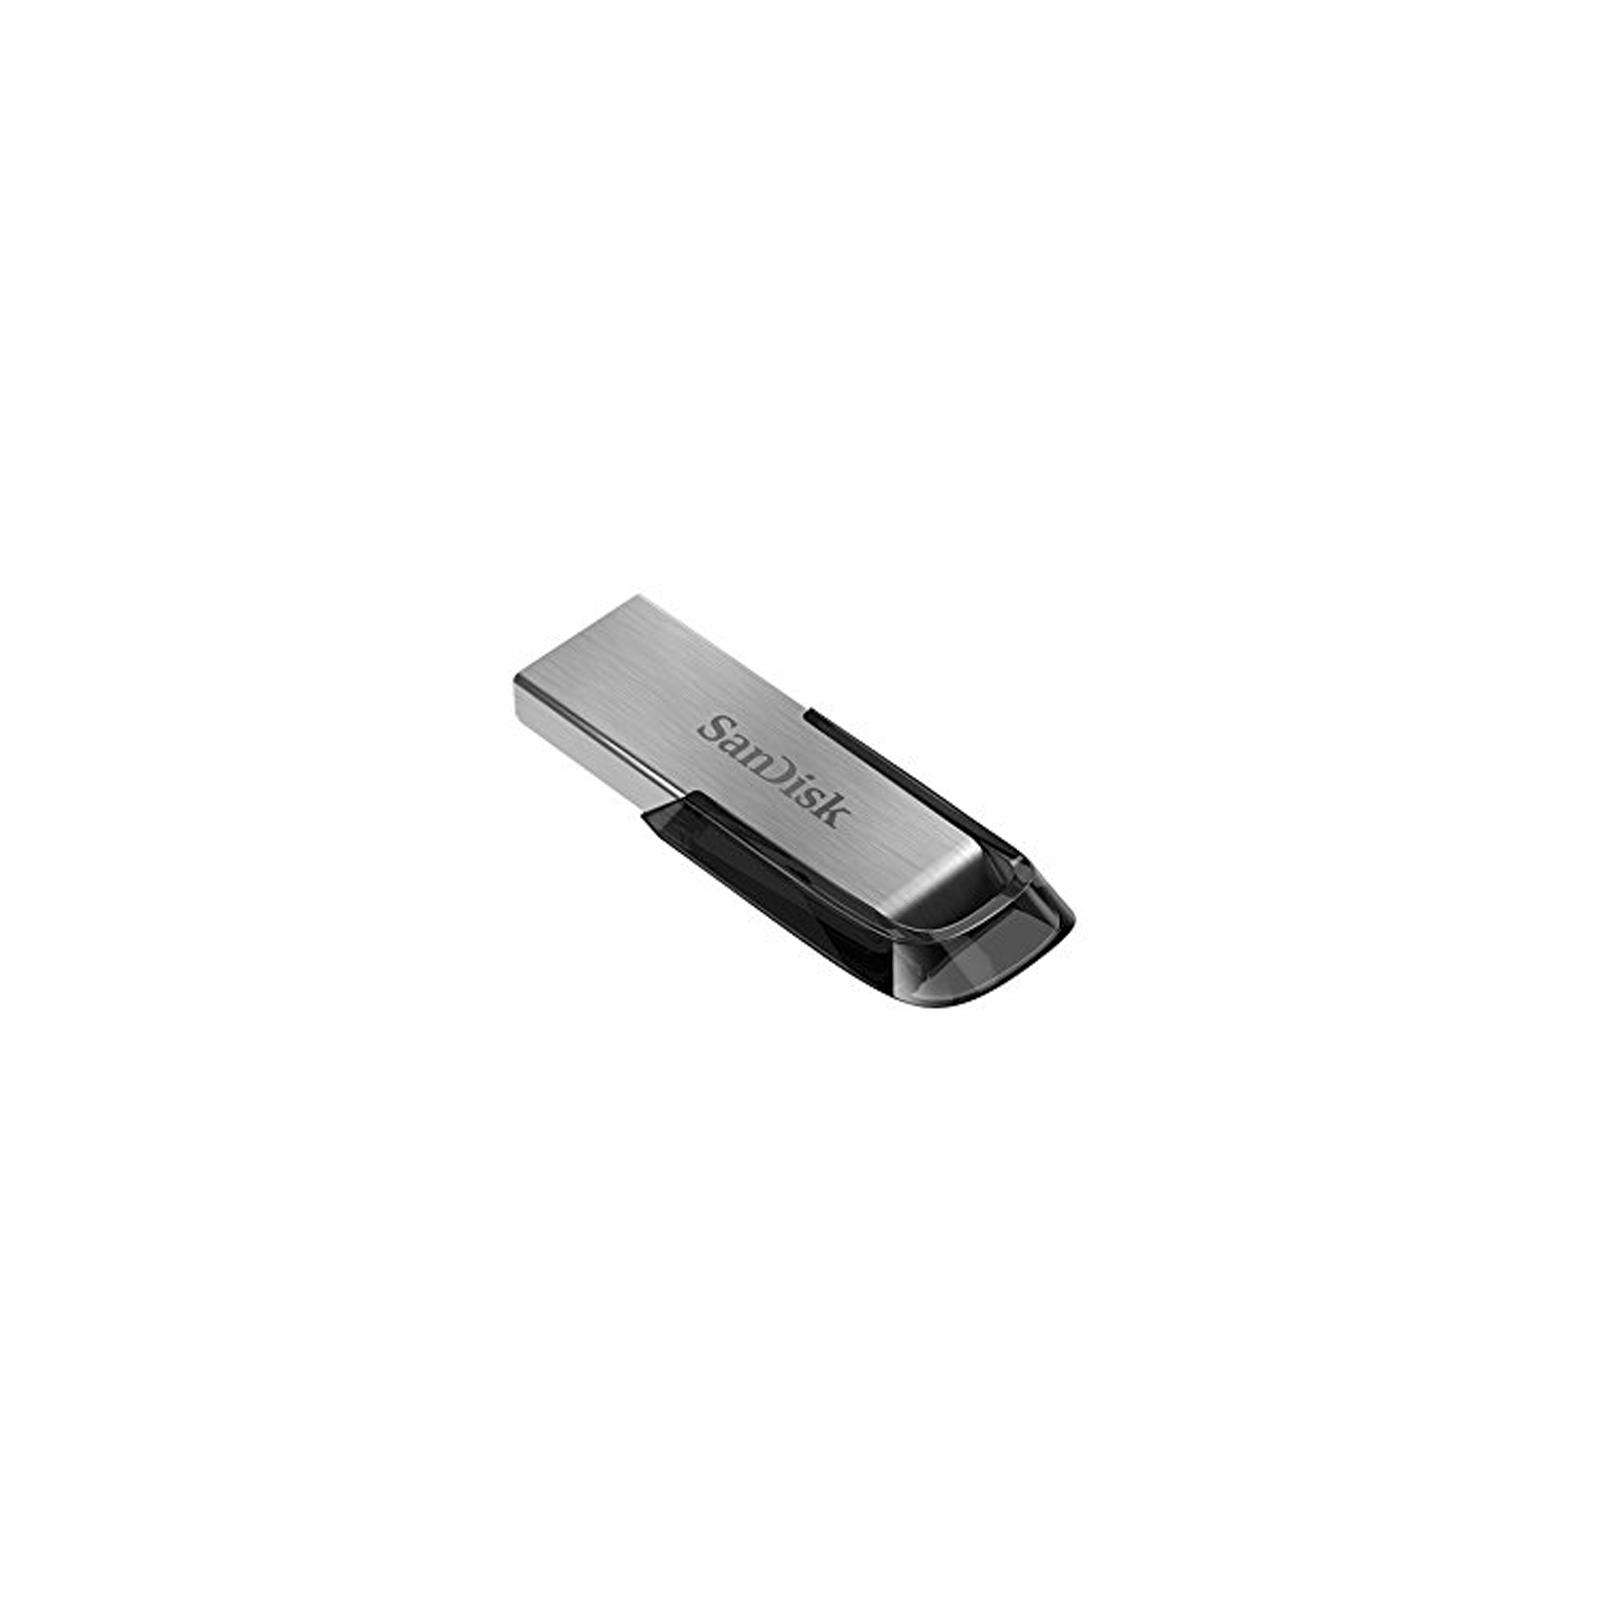 USB флеш накопитель SANDISK 128GB Flair USB 3.0 (SDCZ73-128G-G46) изображение 2